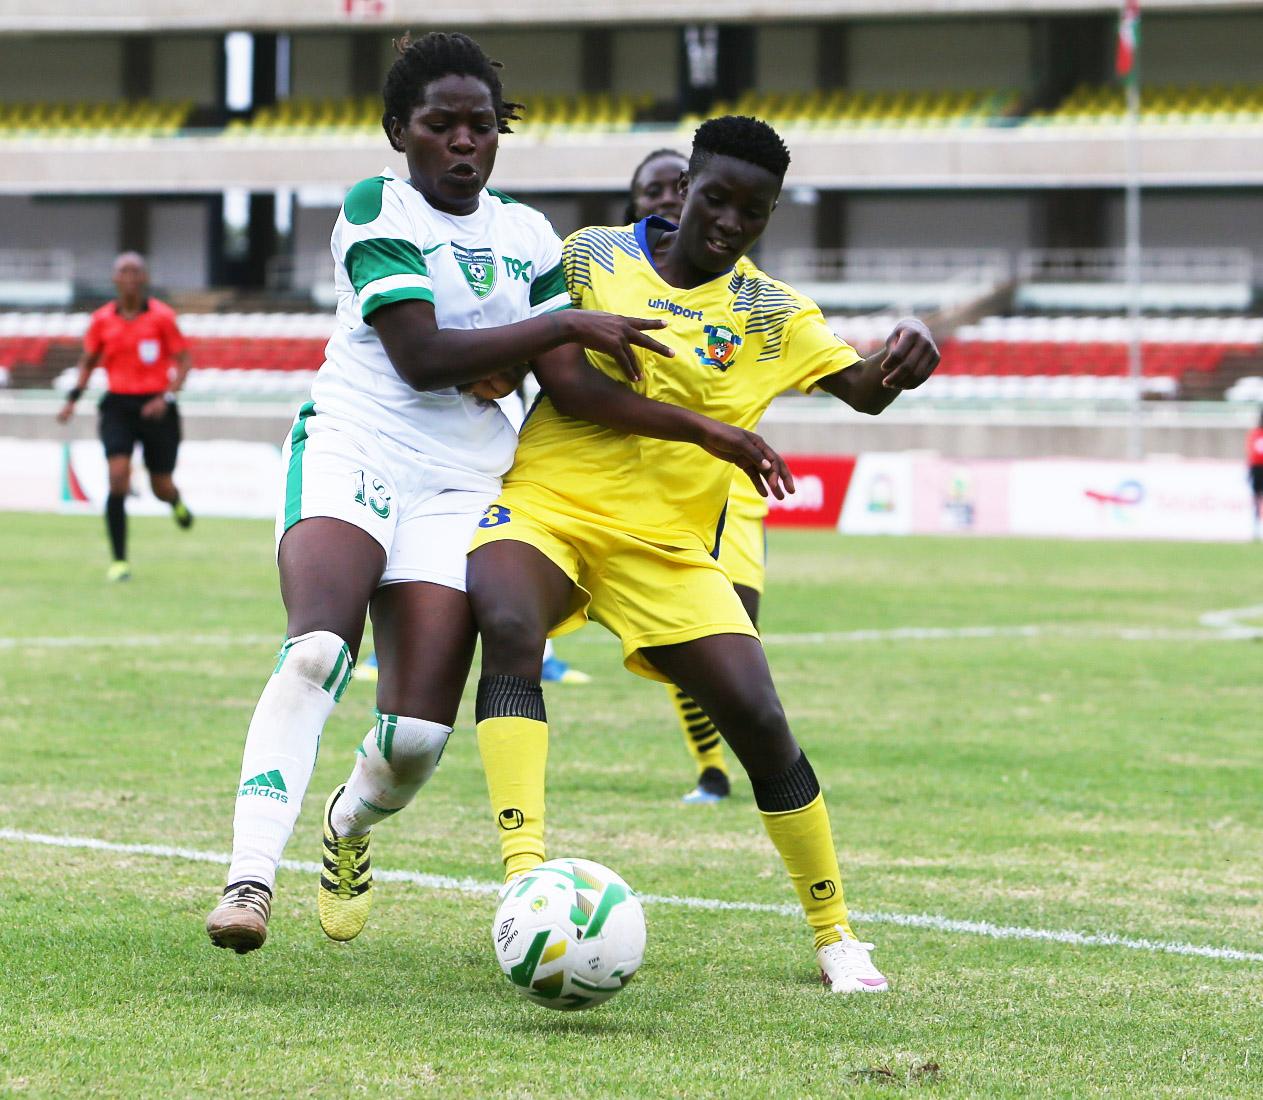 CECAFA WCL QUALIFIERS: Goals galore as Vihiga queens shine over YEI stars